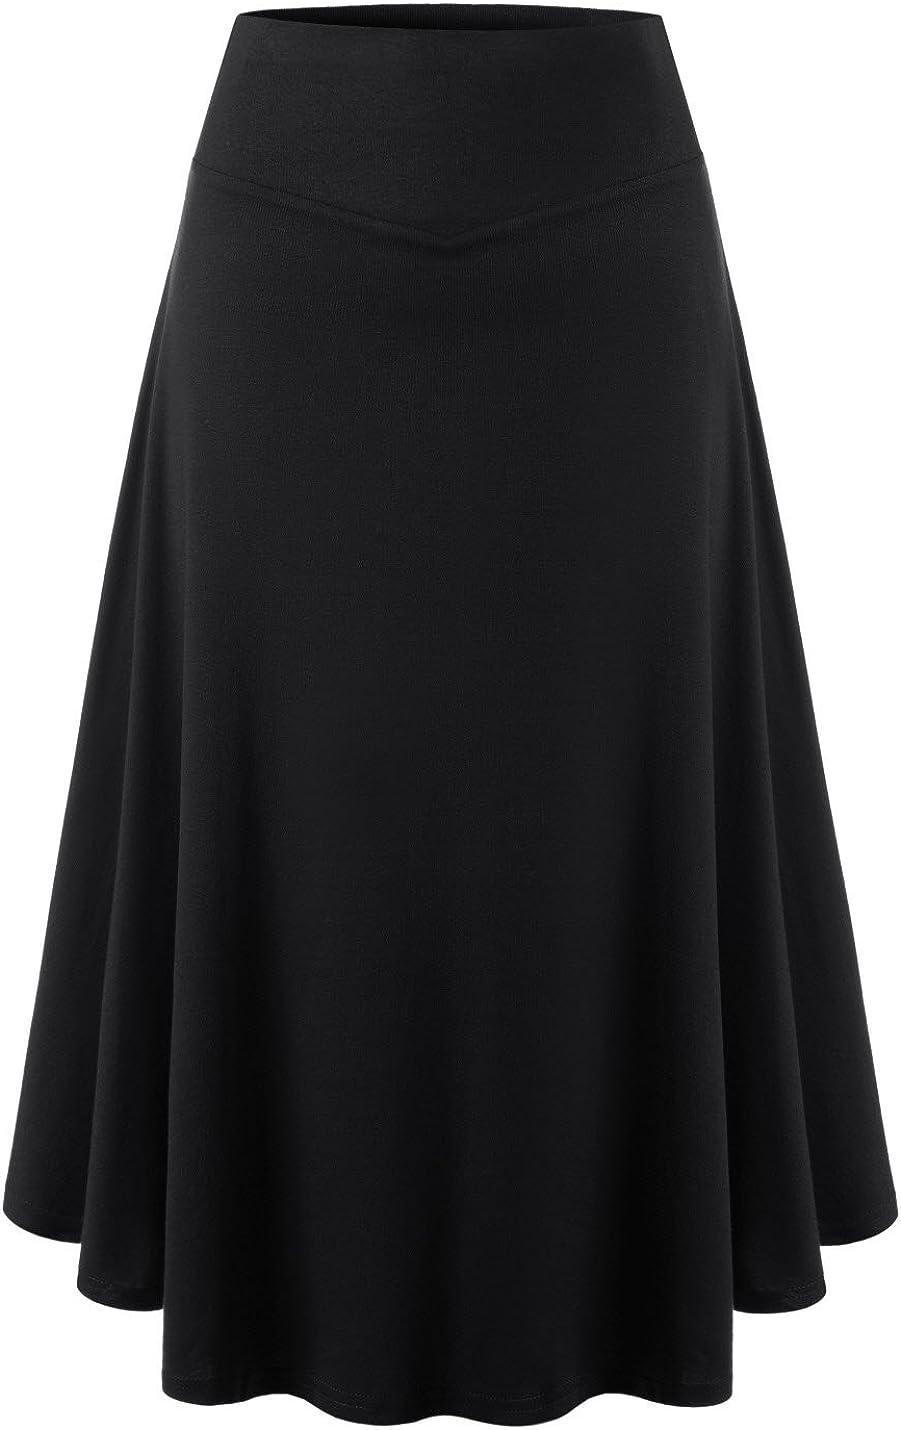 NEARKIN Womens High Waist A Line 1 Mile Wear Midi Wrinkle Skirt